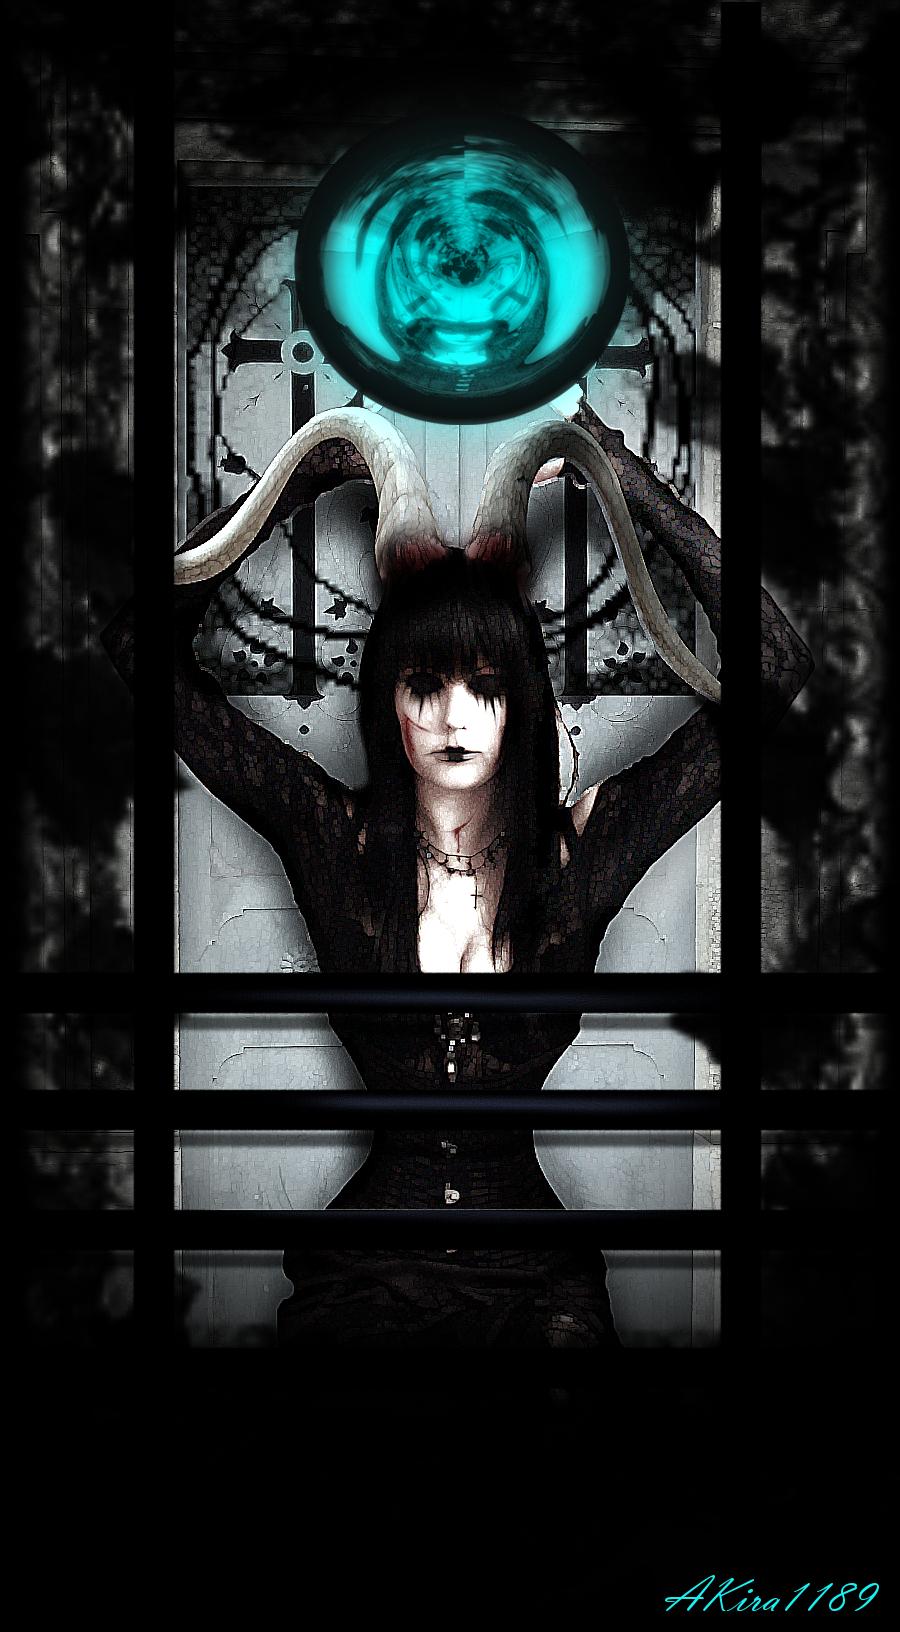 Inside the frame by AKira1189